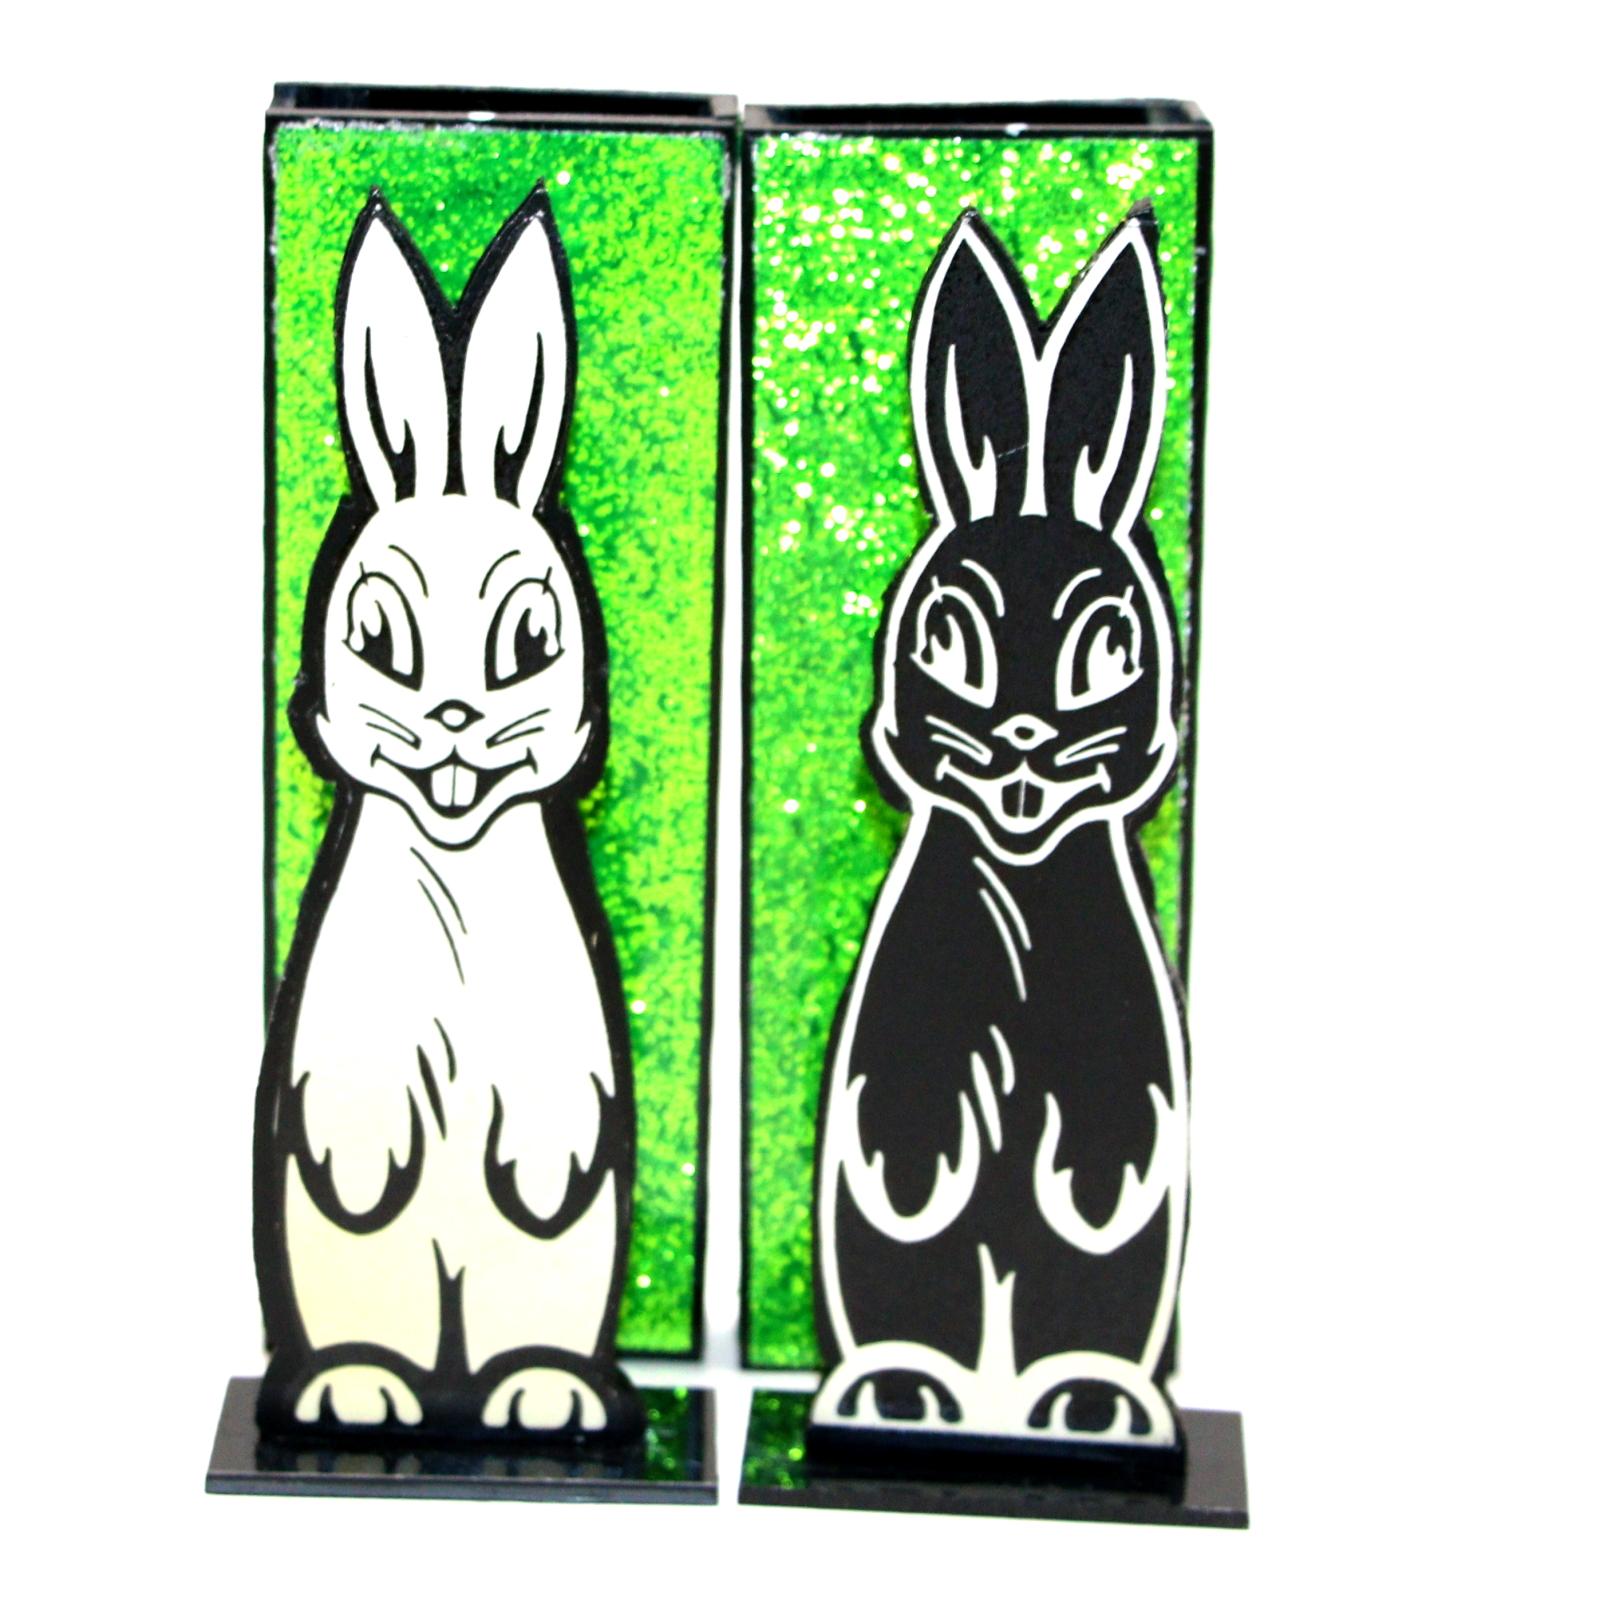 Nu Hippity-Hop Rabbits by Vienna Magic